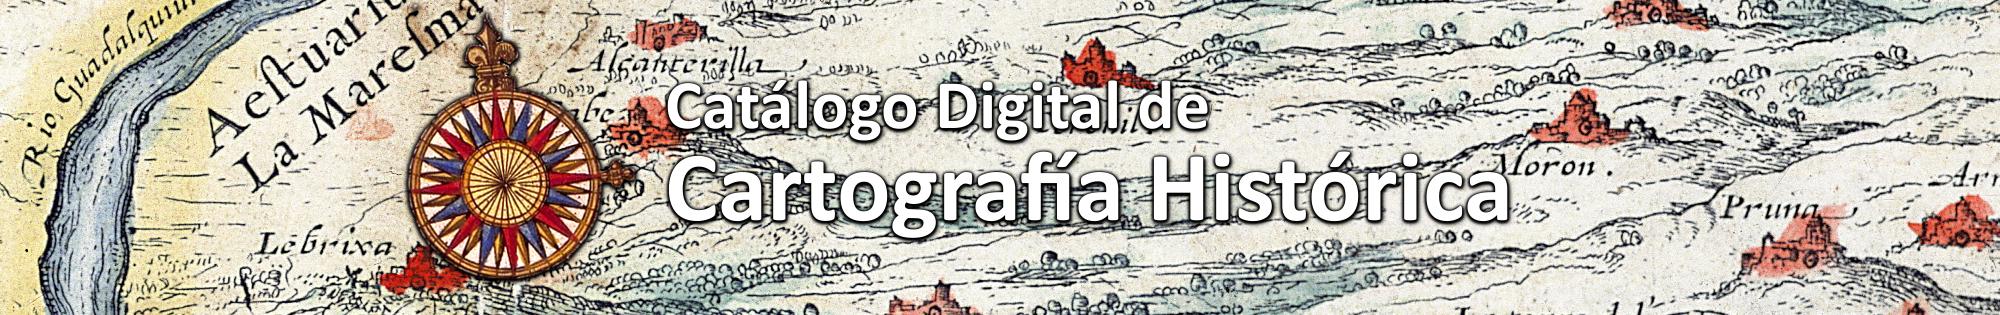 Catálogo Digital de Cartografía Histórica